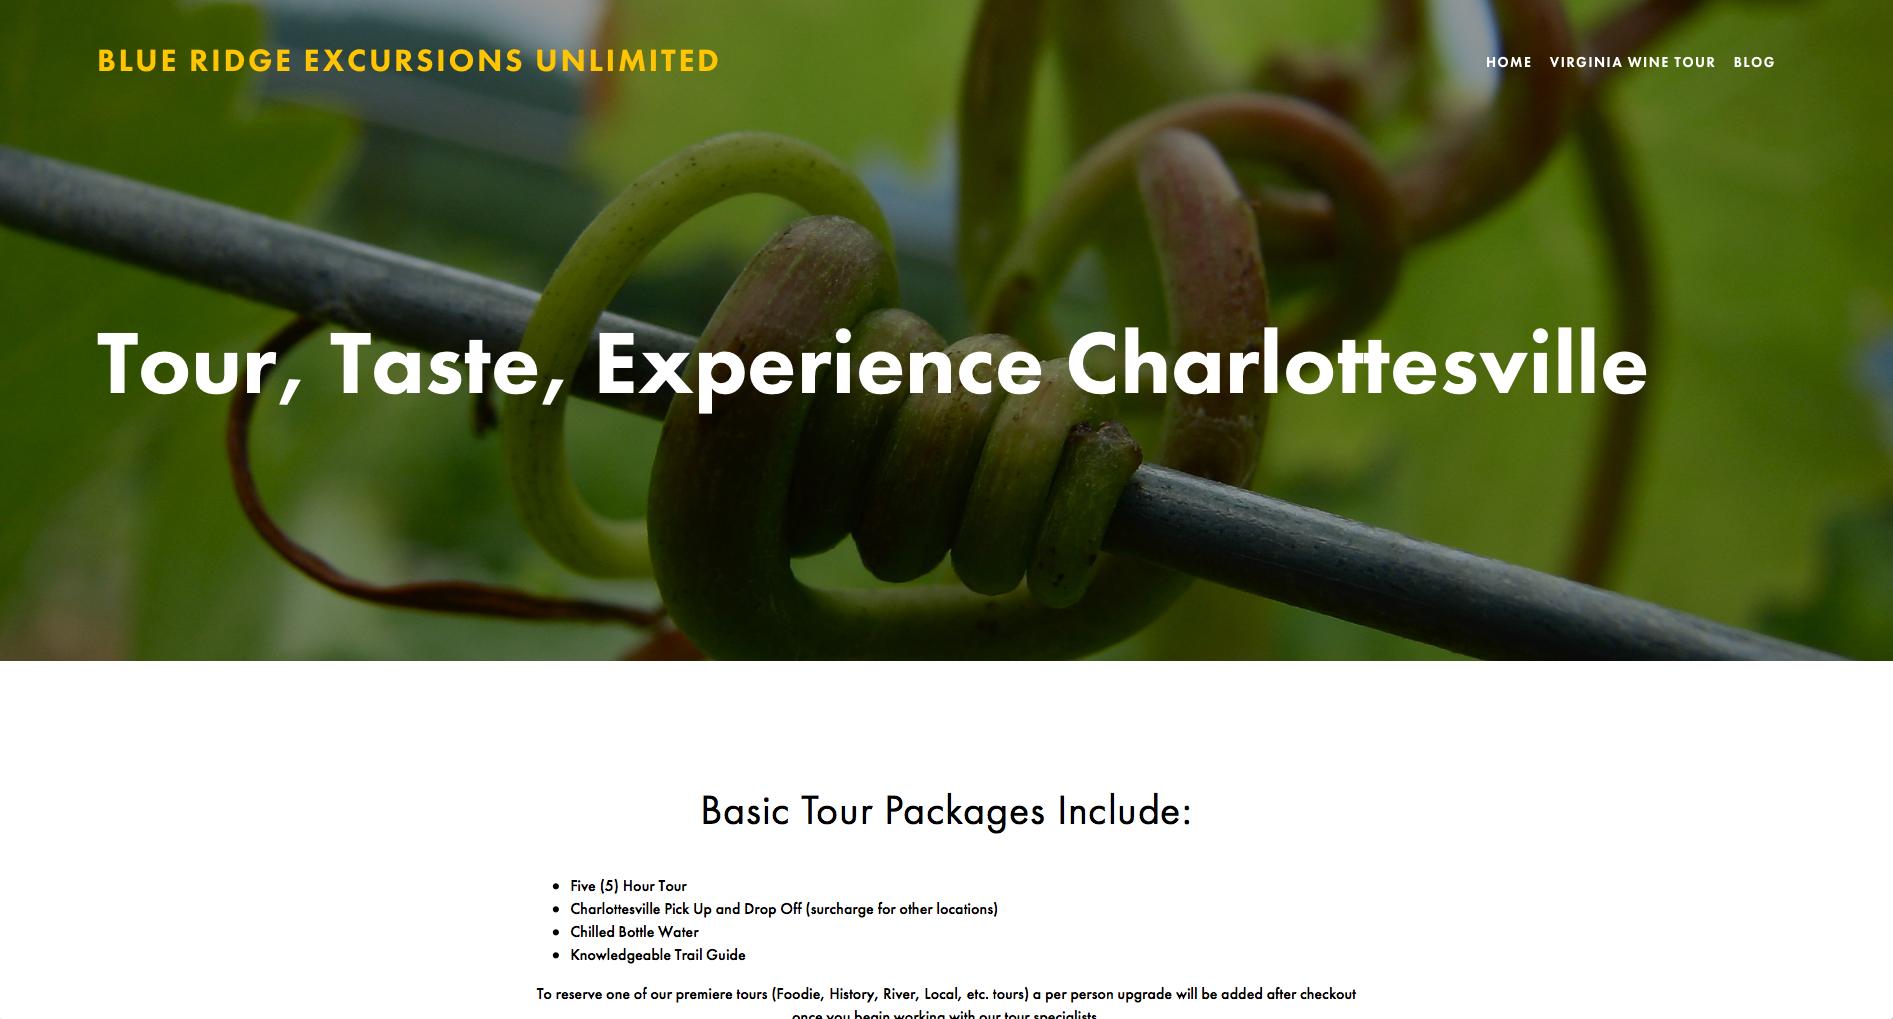 Website Design - Blue Ridge Excursions Unlimited